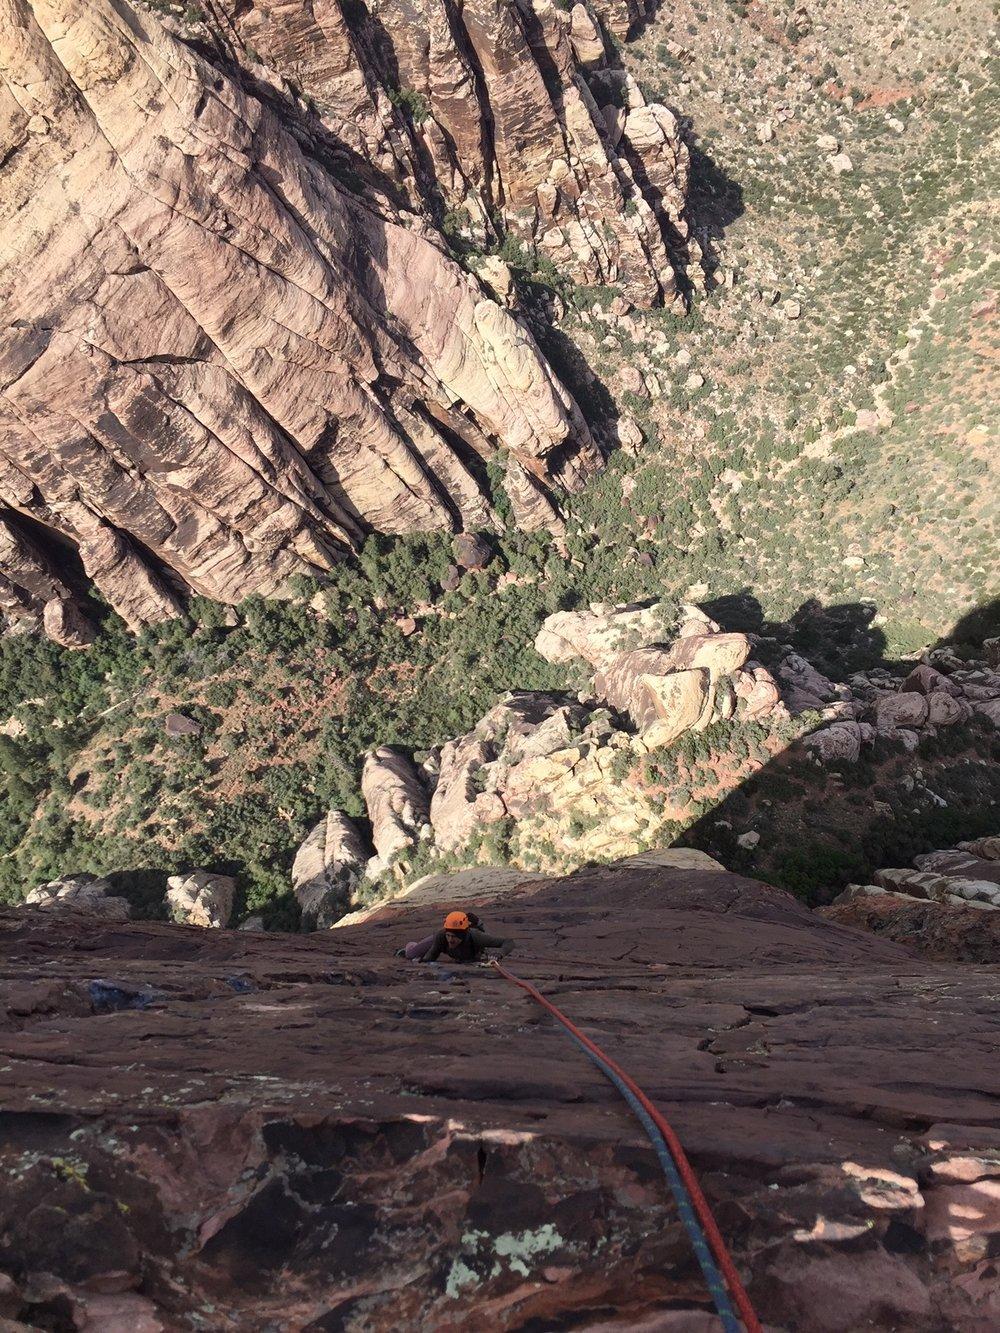 3 Person Rope Team Red Rock Nevada 2 Alpine Climber Rock Climbing SAANO Adventures Trad Climbing Multi Pitch.JPG